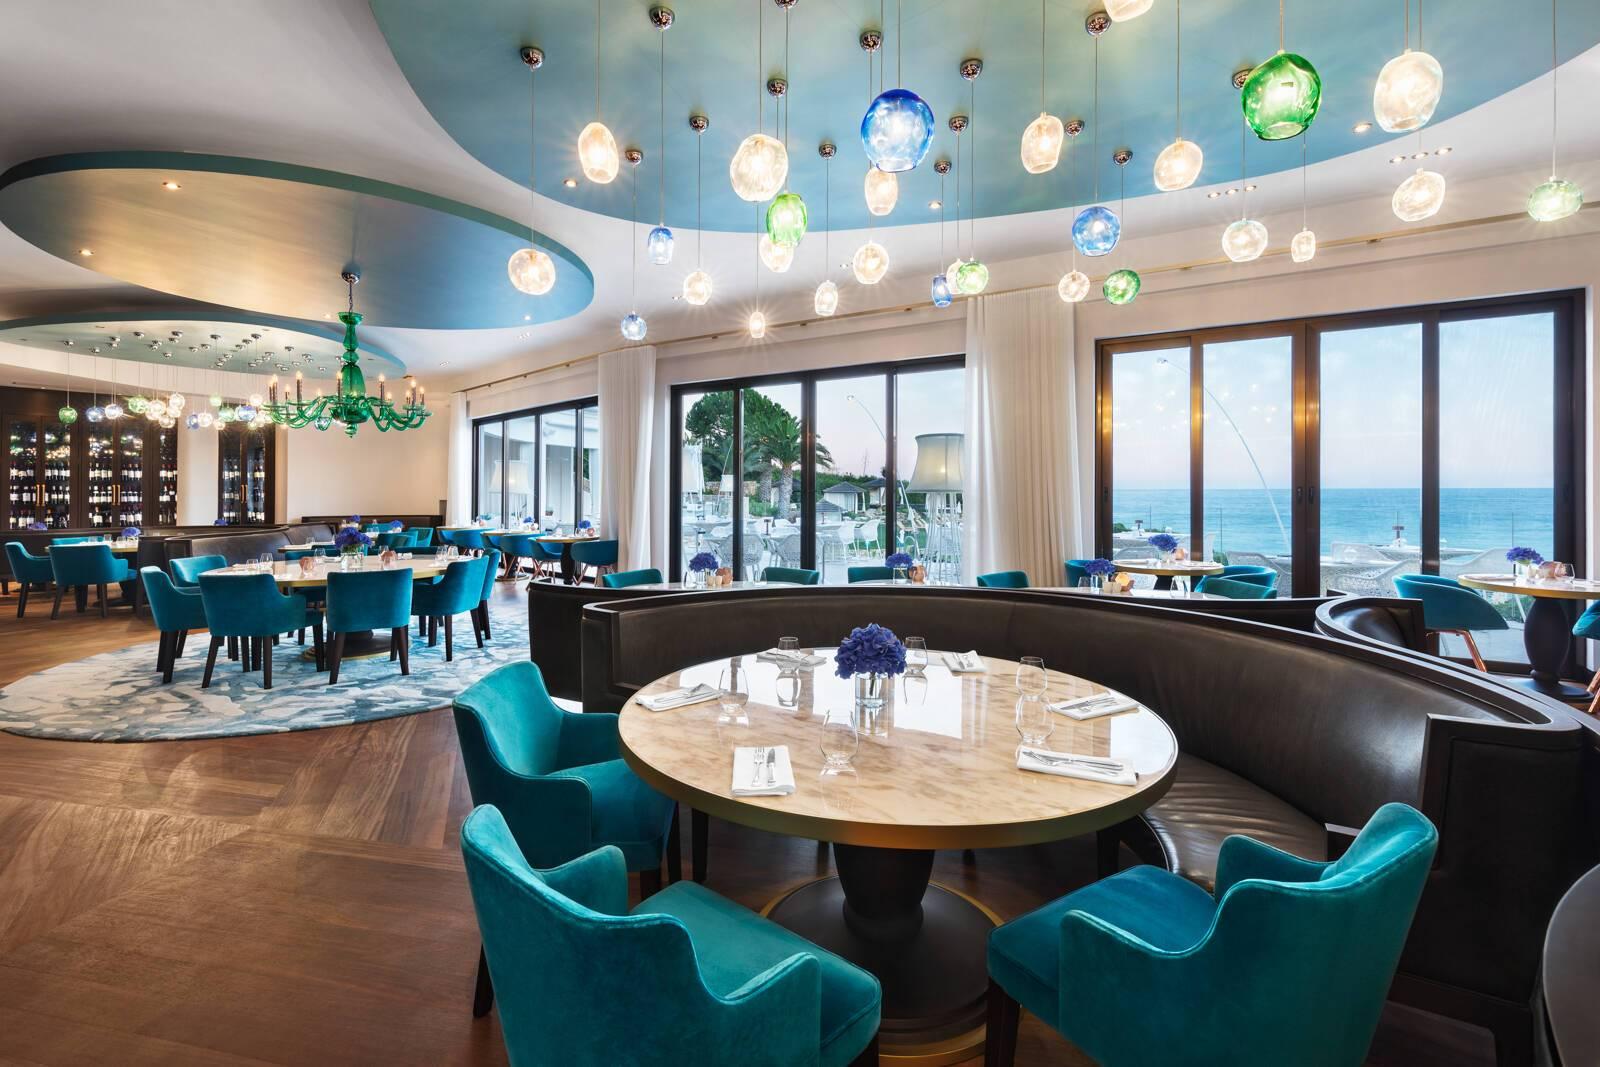 Vila Vita Parc Portugal Algrave Atlantico Restaurant